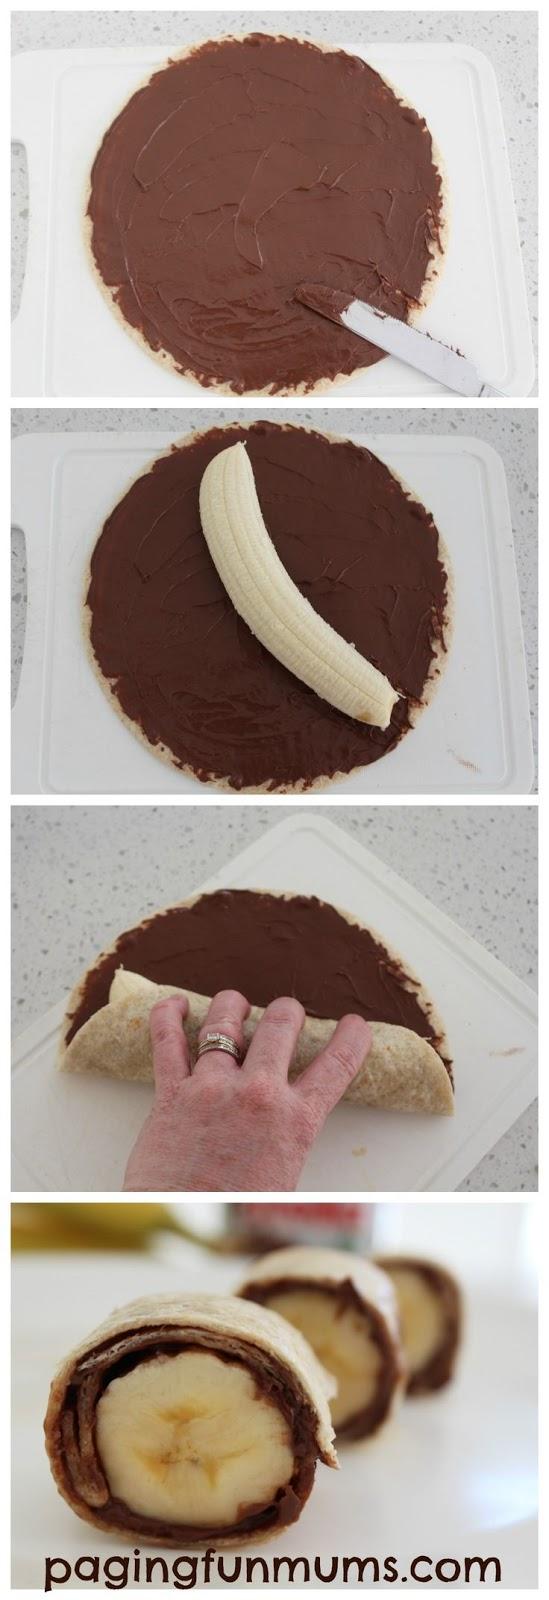 Nutella Banana Roll Up